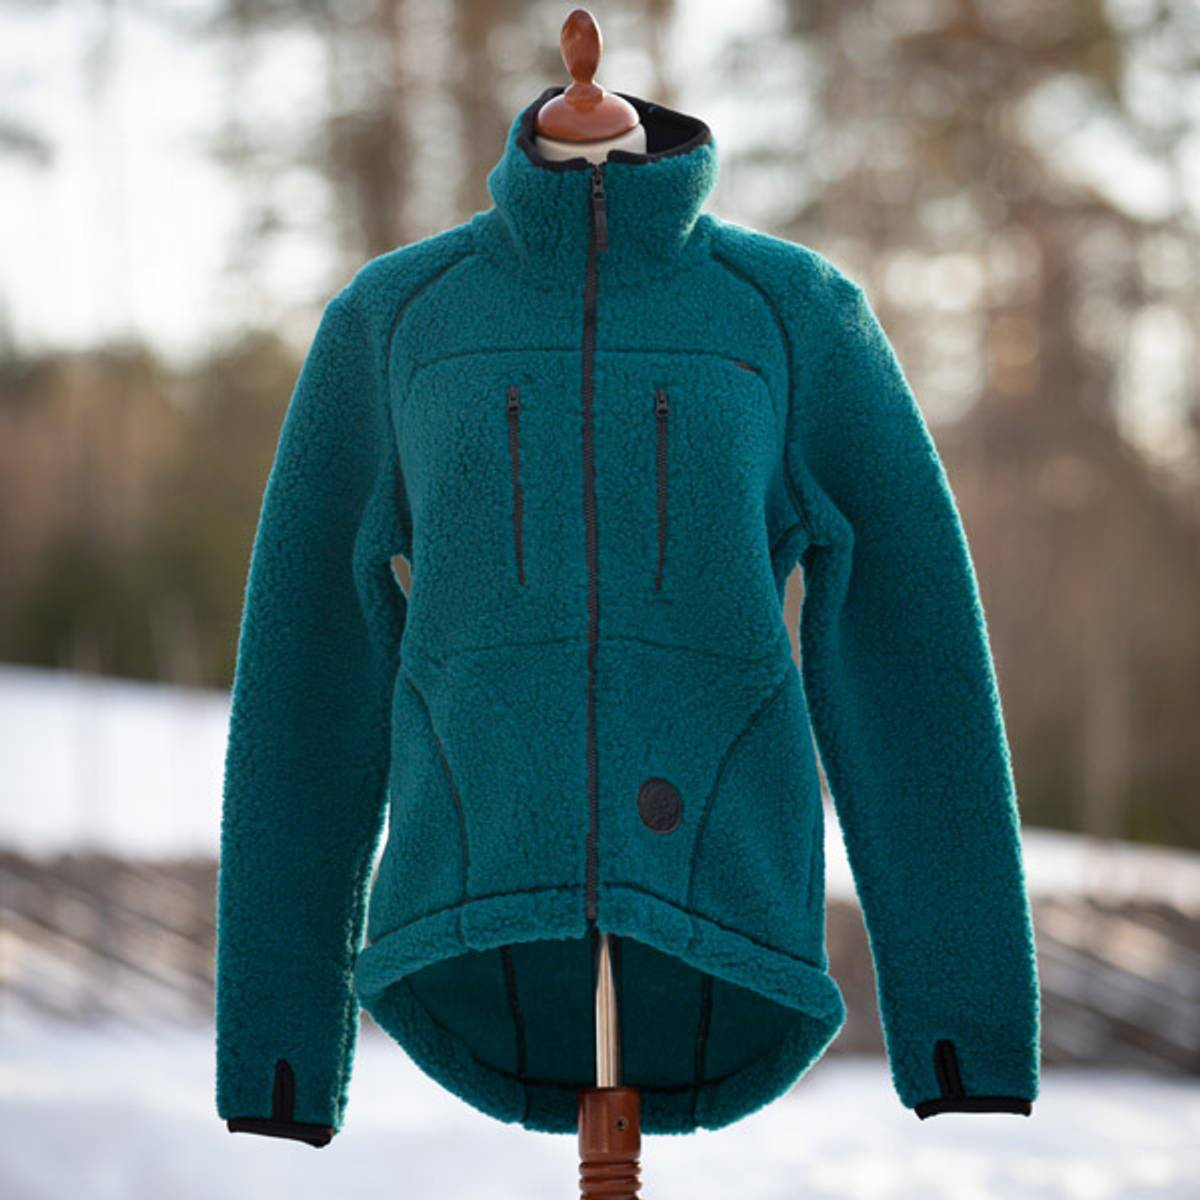 GRIMSBU - Merino wool jacket